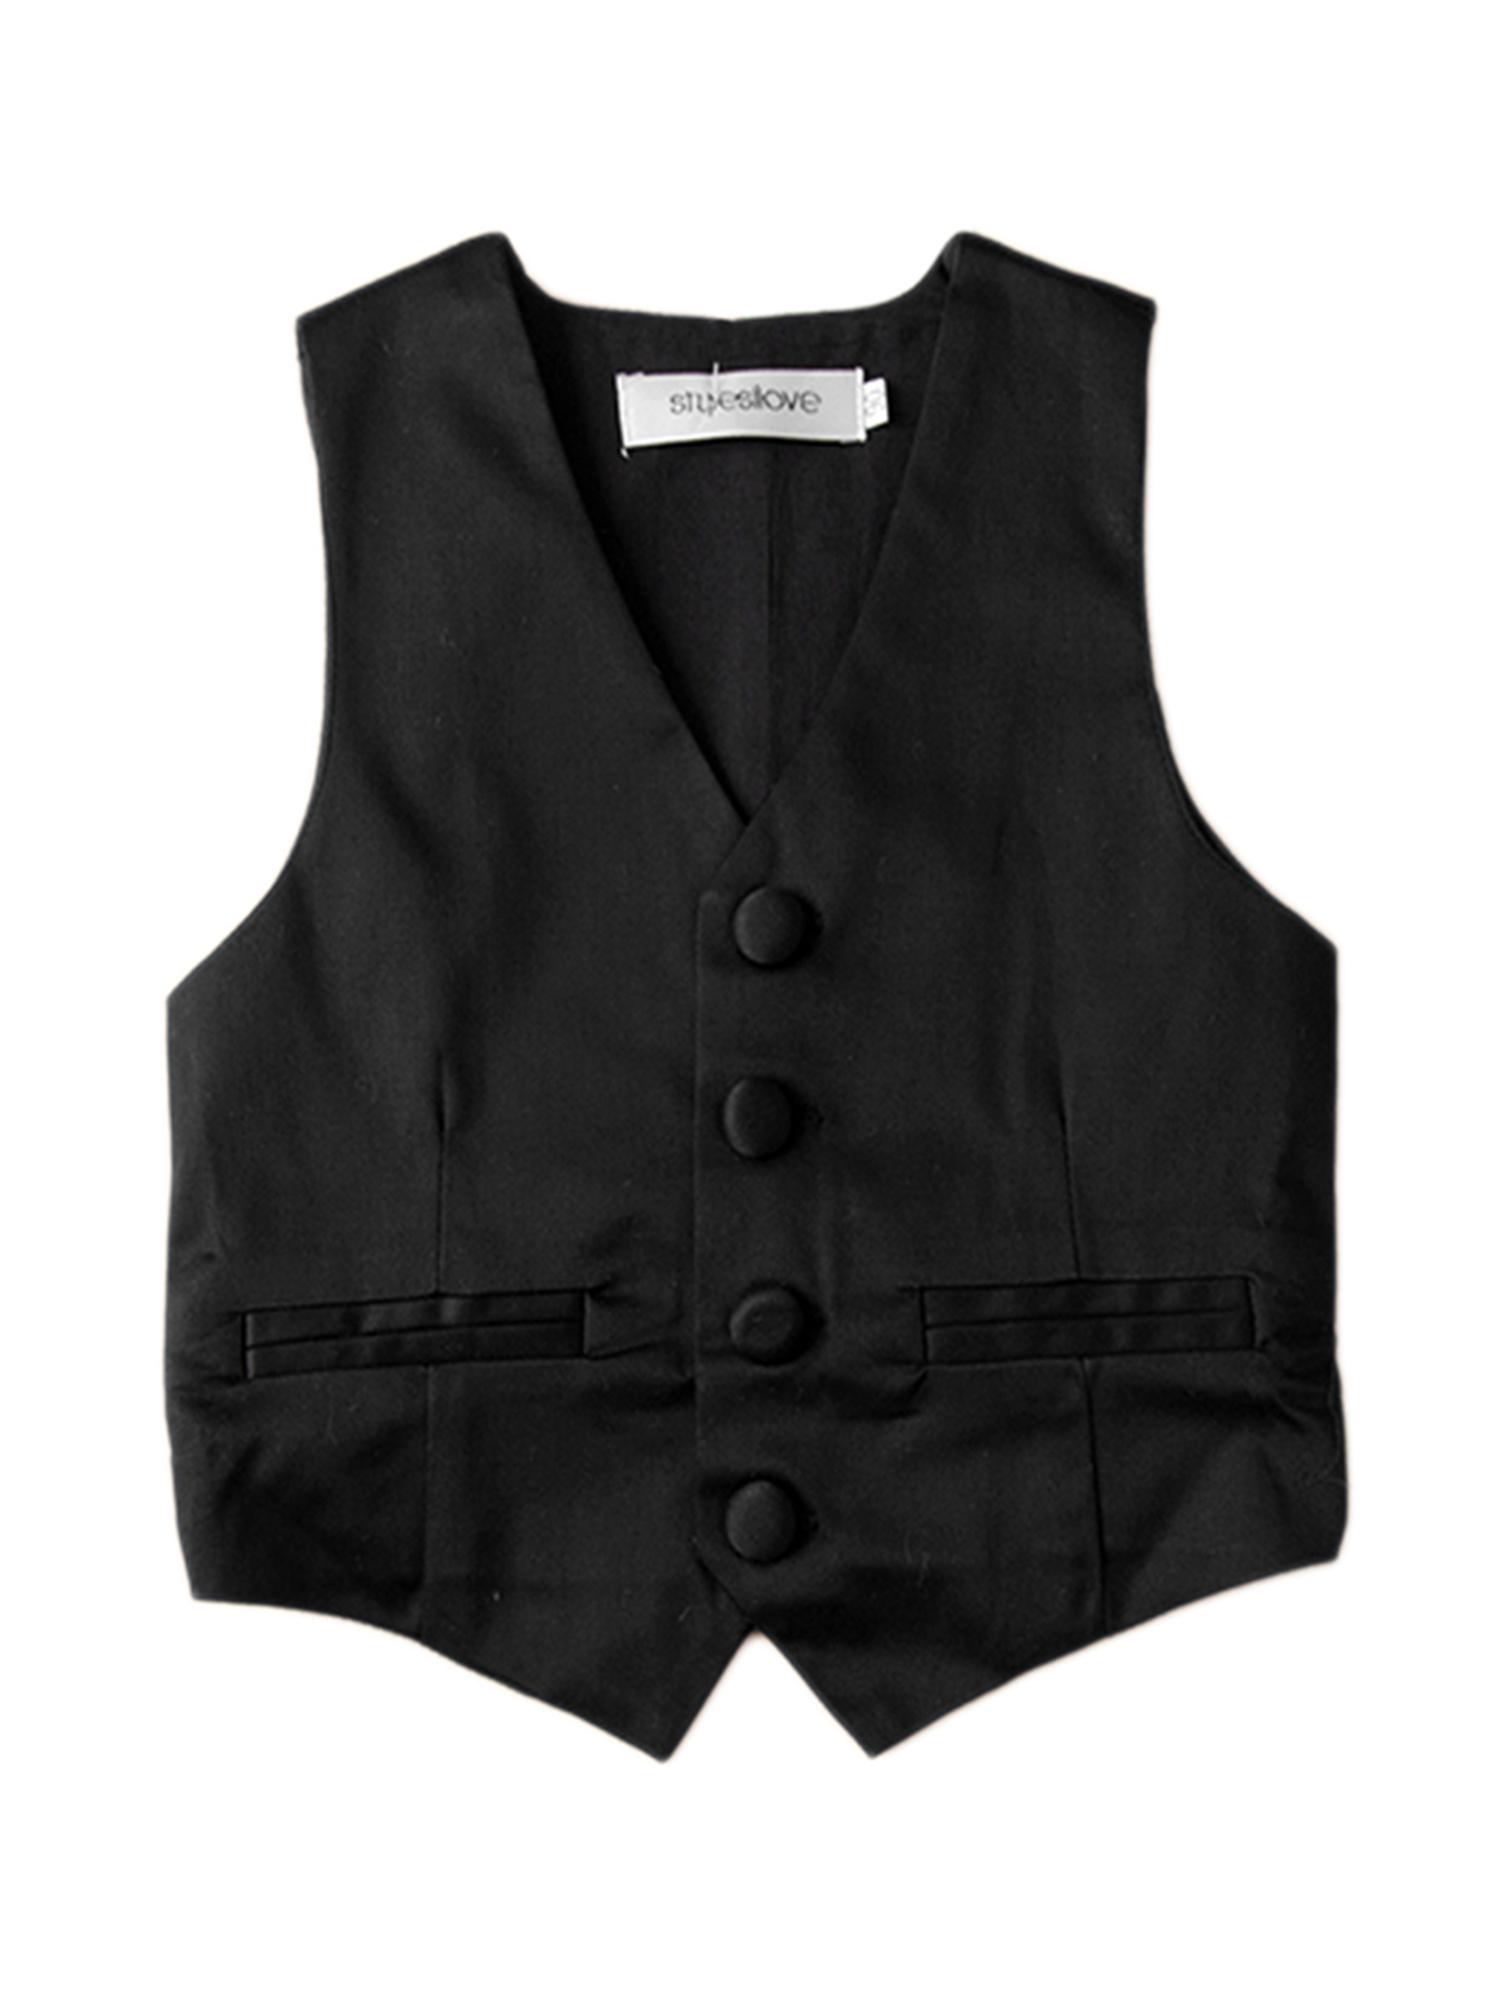 Stylesilove Baby Kids Boy Classic Gentlemen Tuxedo Vest (2-3 Years)